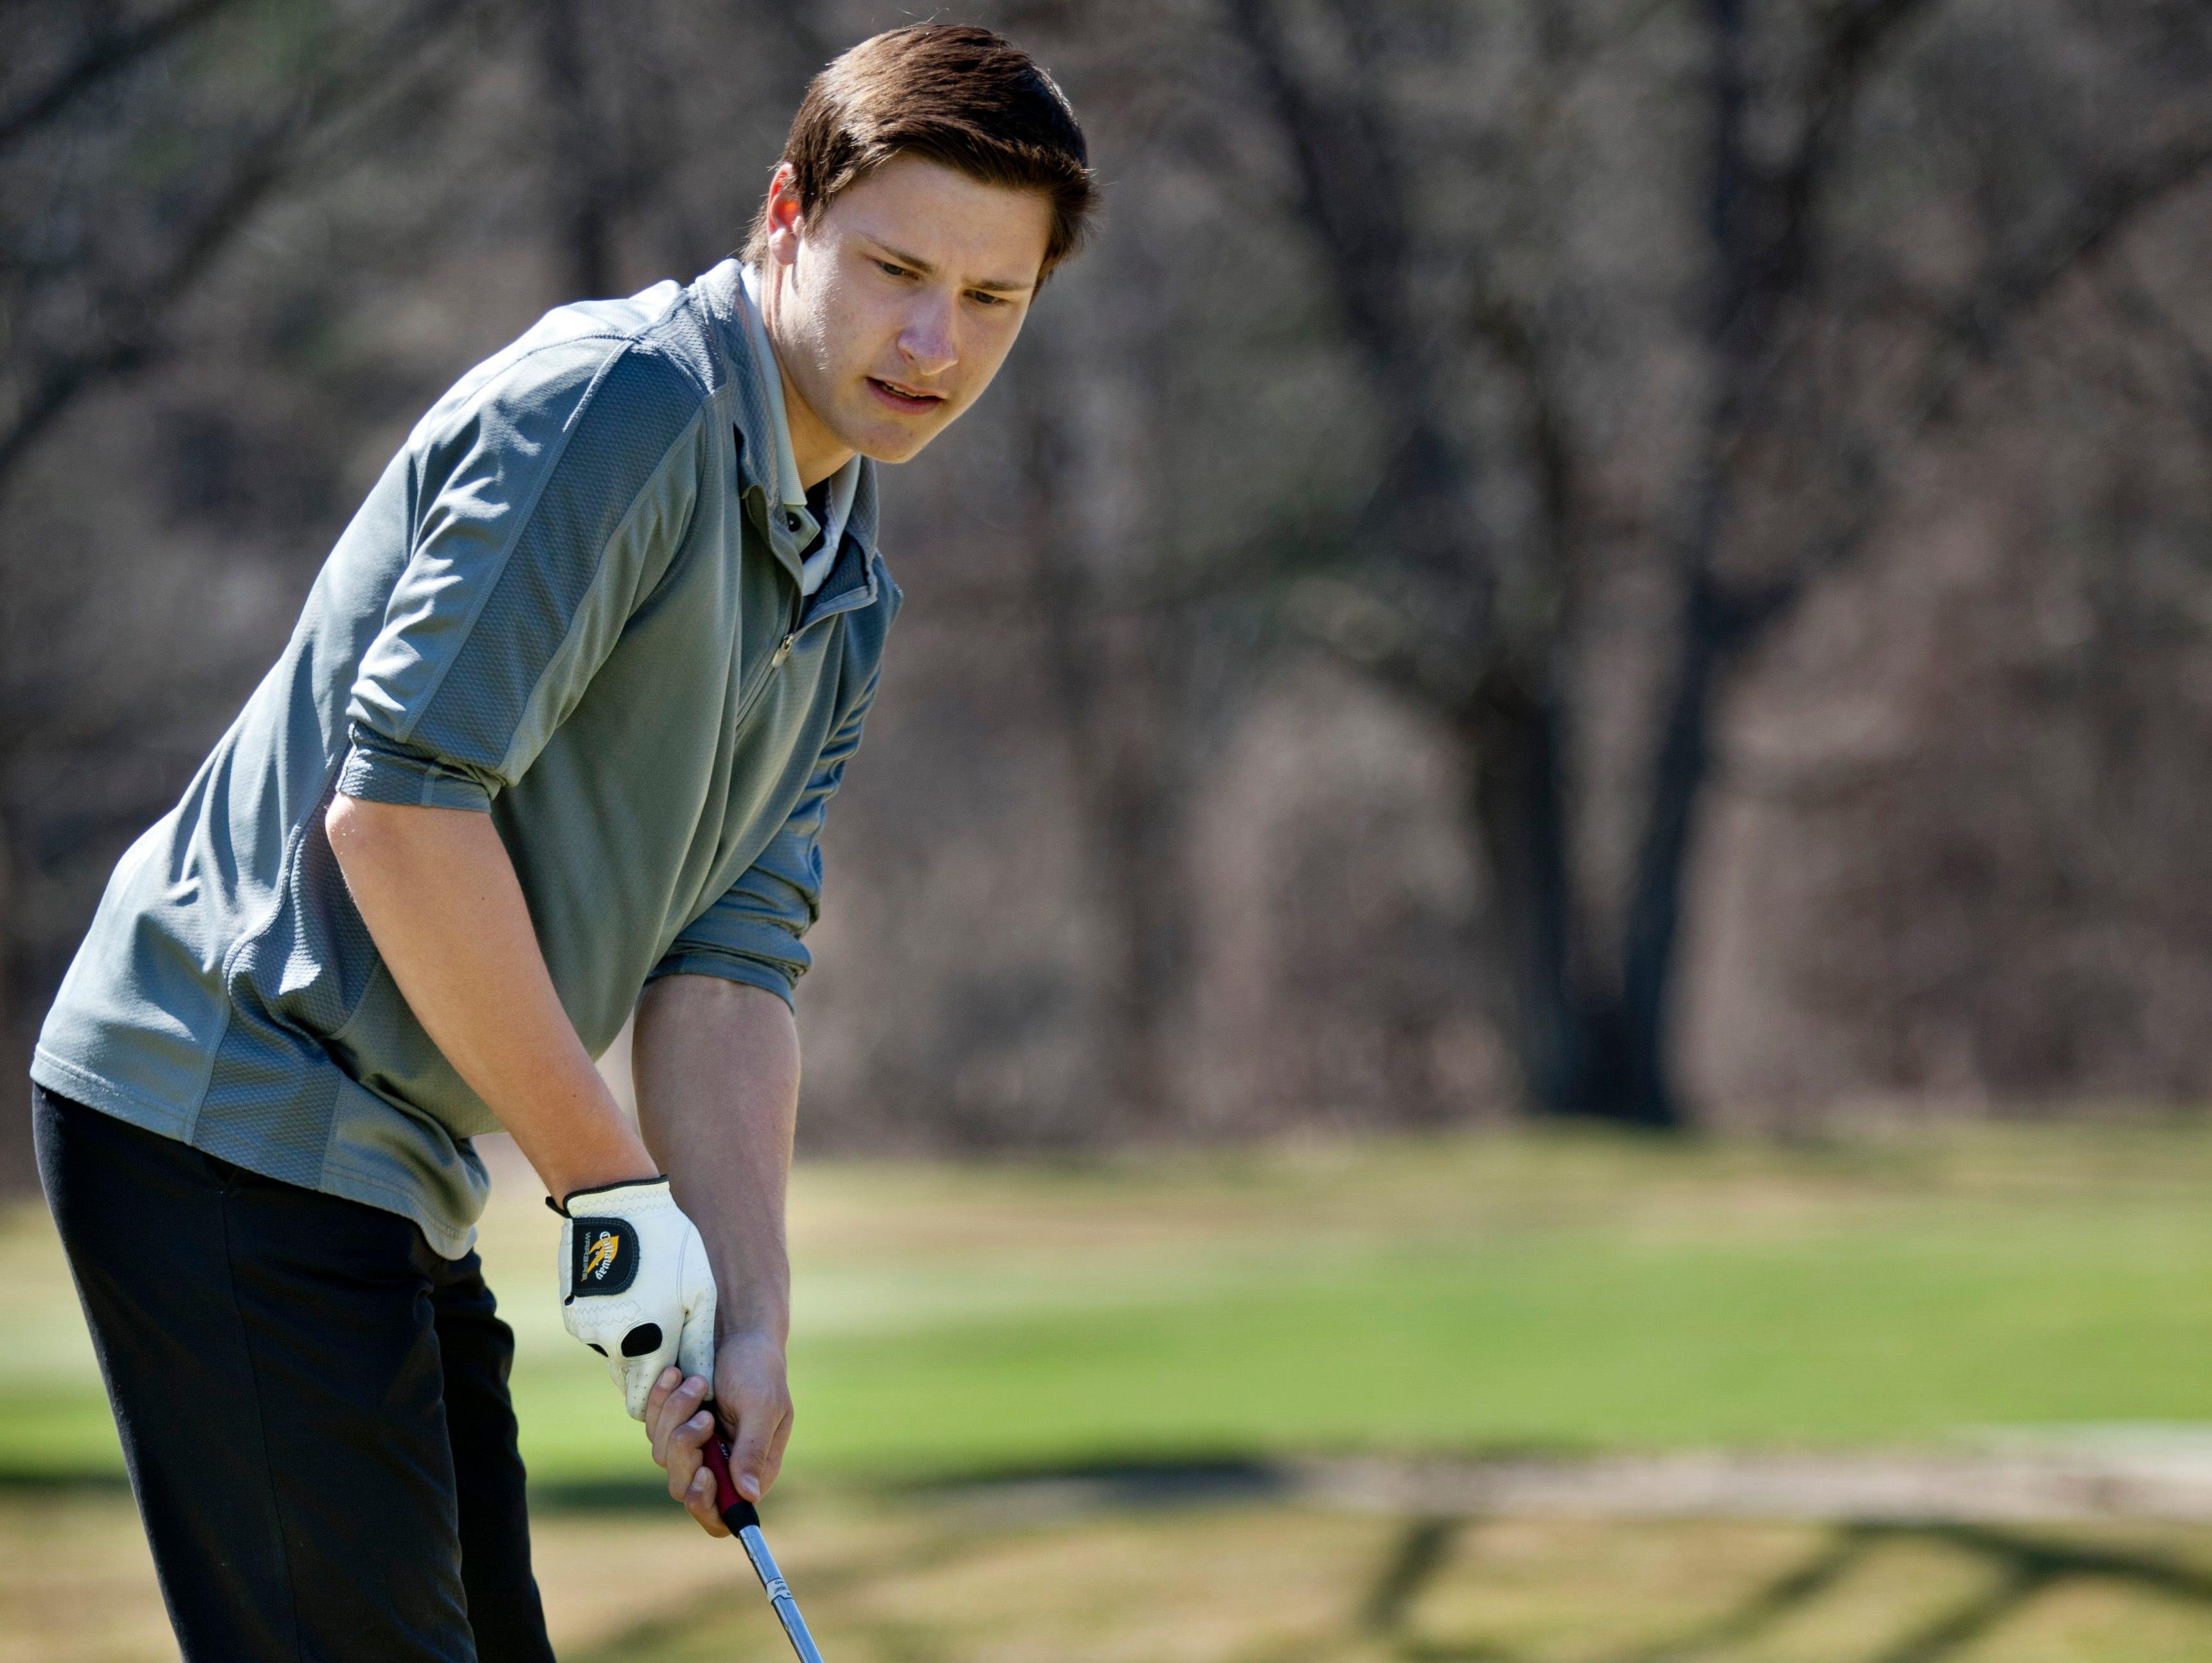 Marysville junior Seth Lewis, 18, sinks a putt Friday at the Port Huron Elks Golf Club in Port Huron Township.